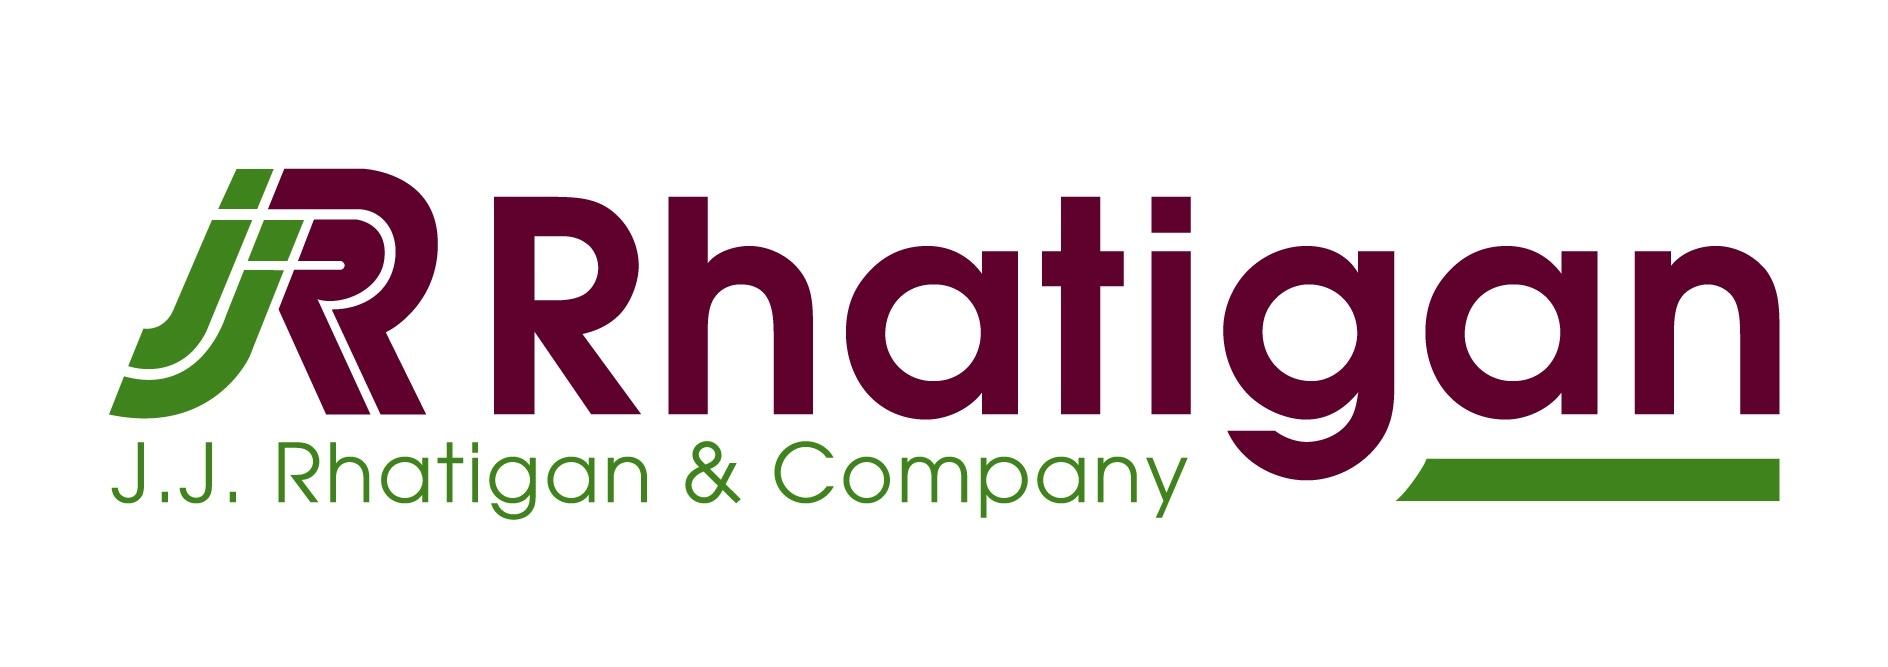 J-J-Rhatigans-New-logo